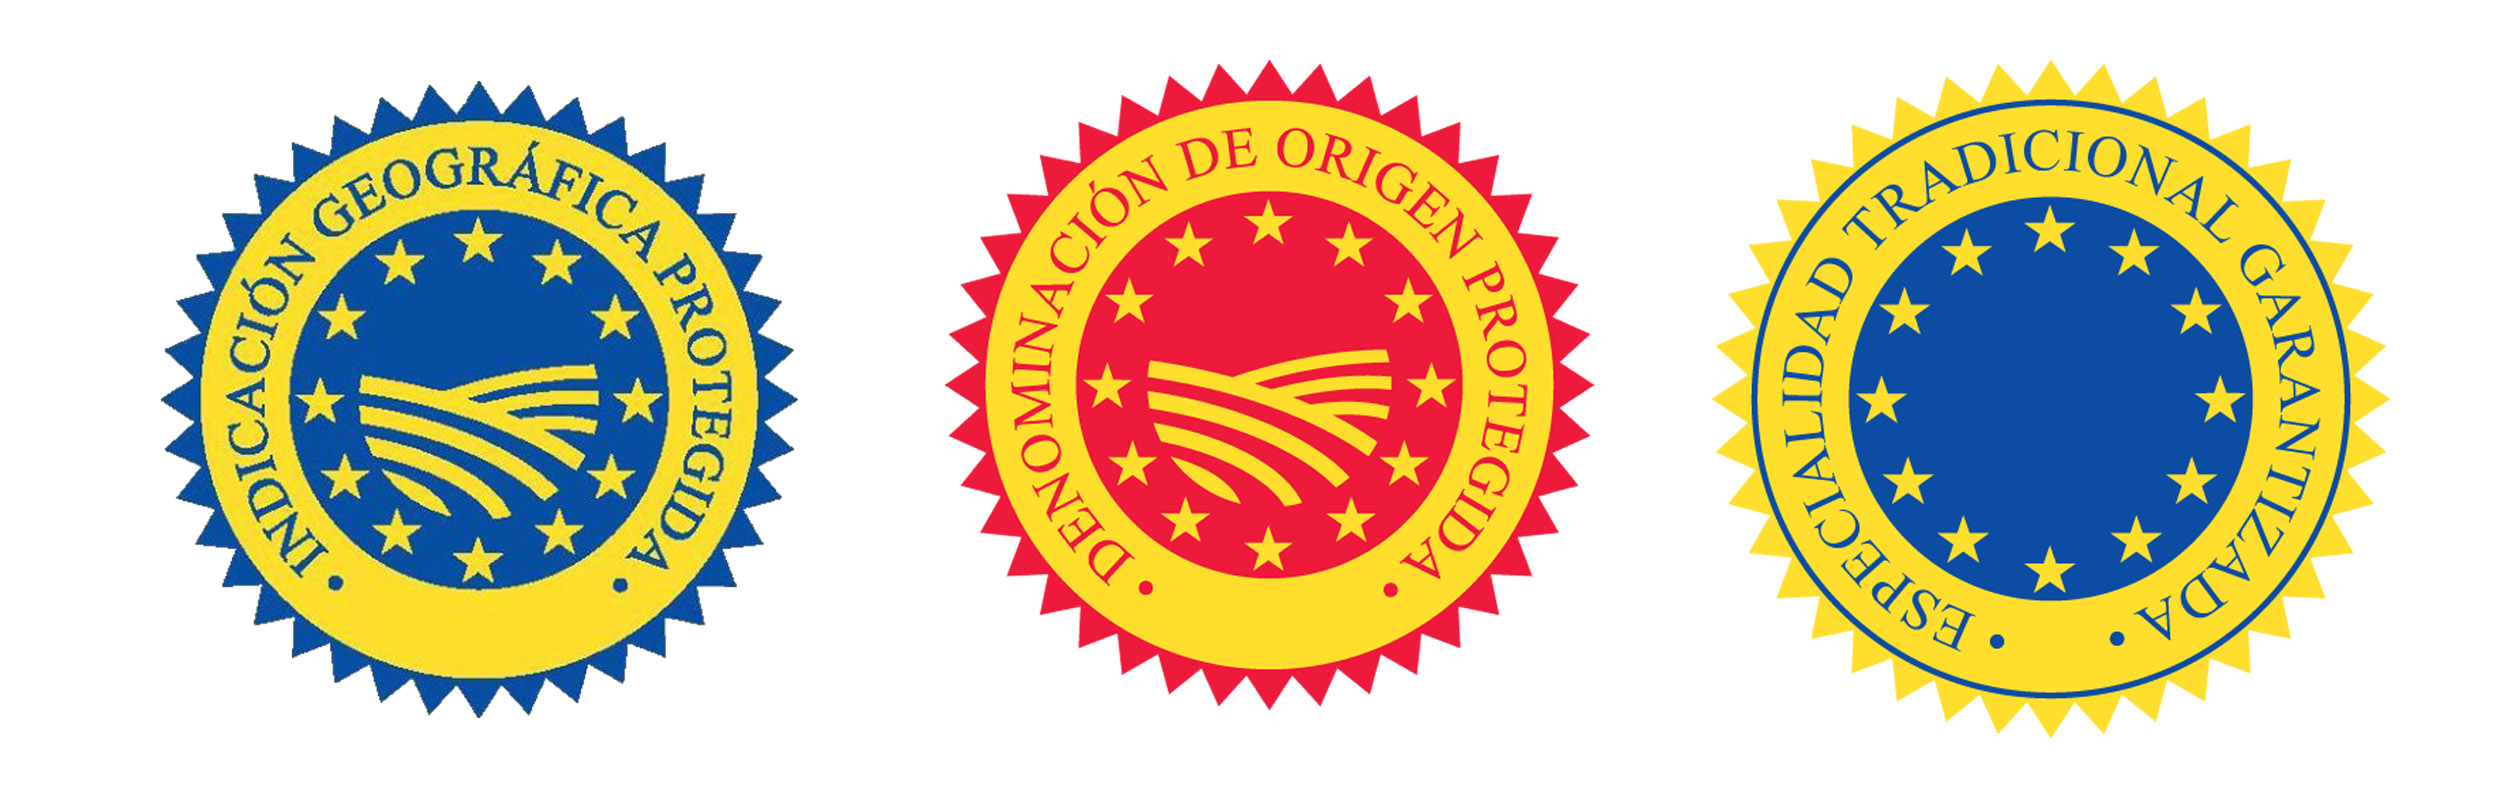 Logos IGP DOP ETG